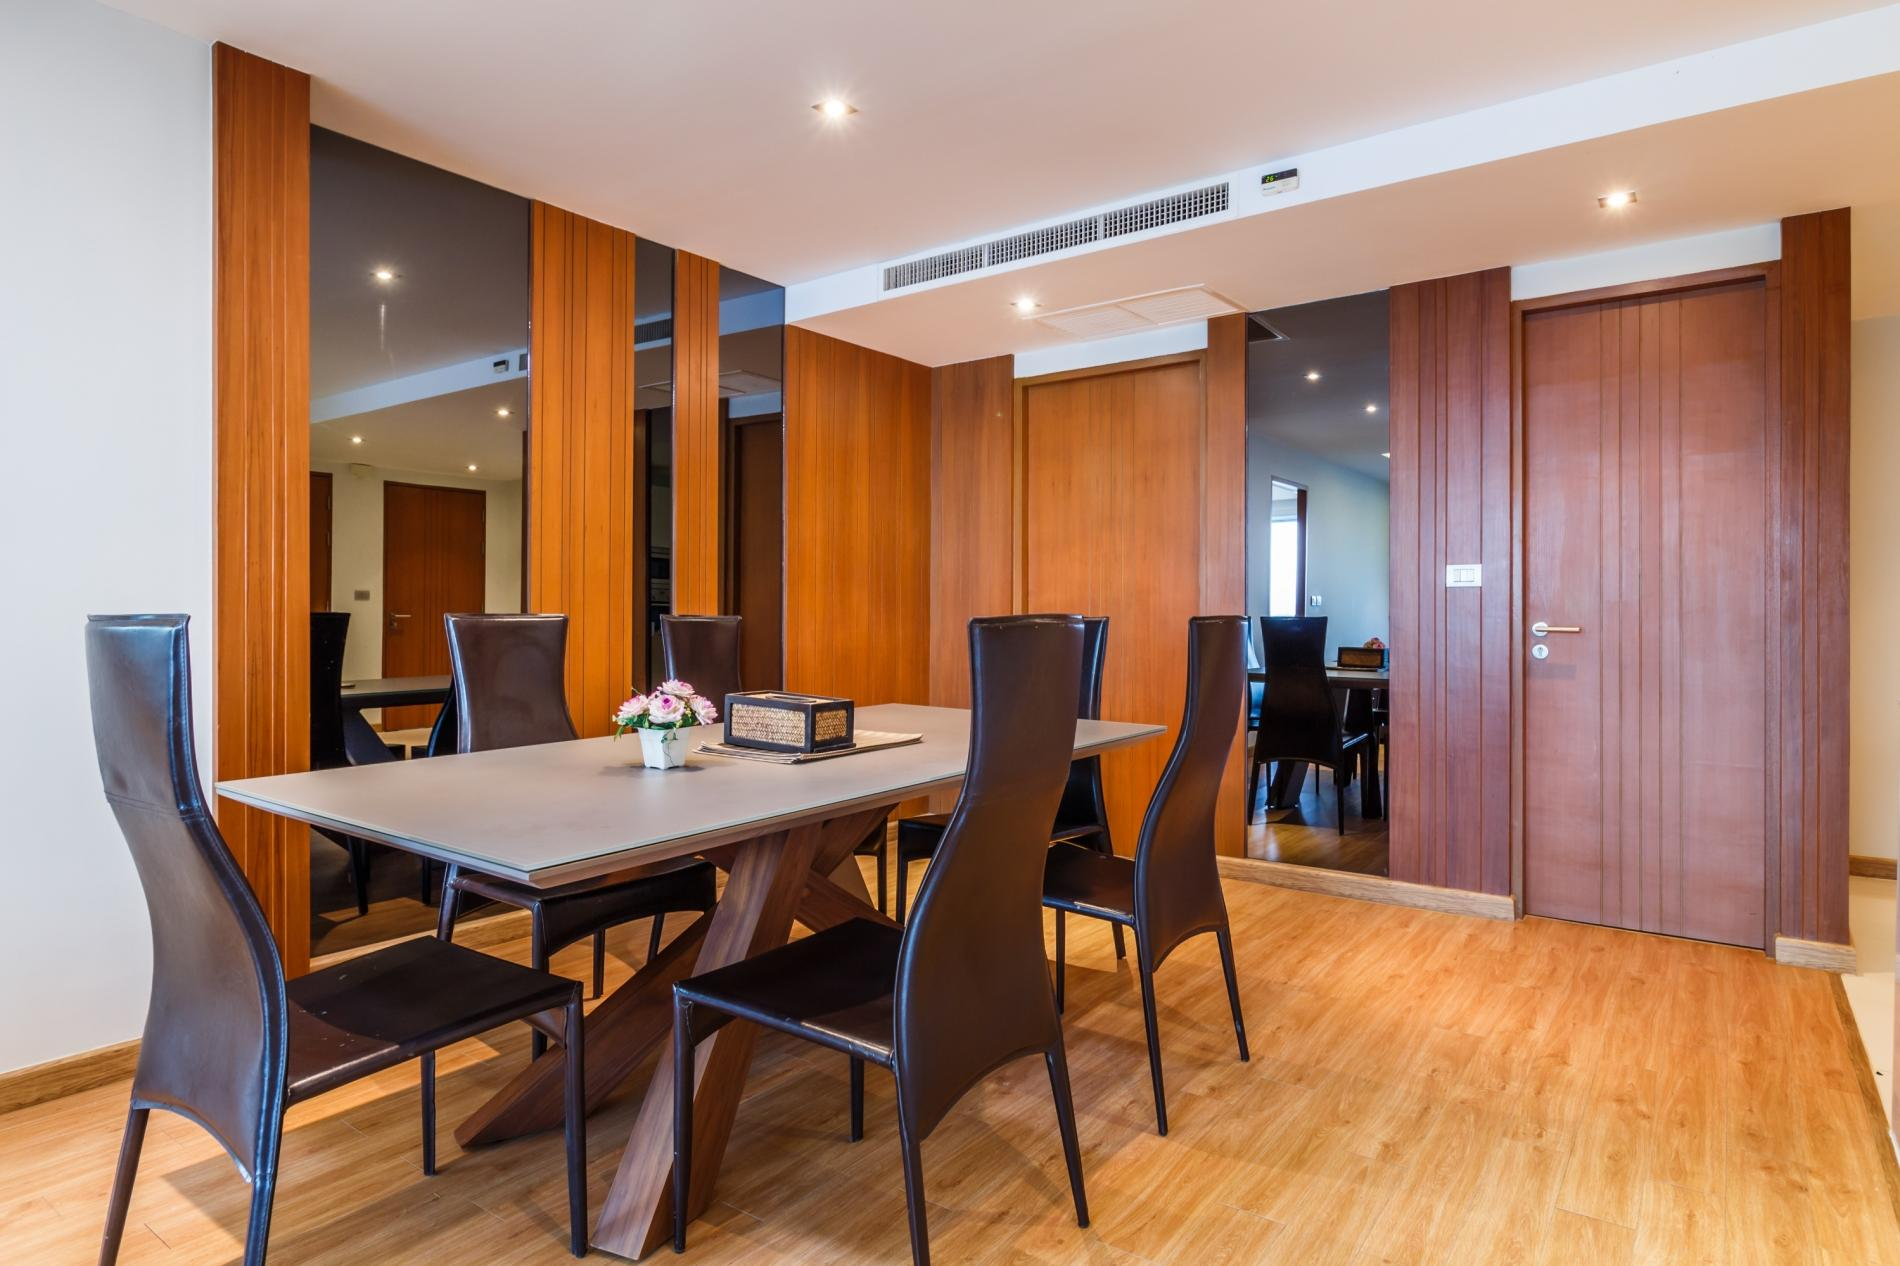 Apartment Privilege12 - Seaview 3 bedroom luxury apartment on Kalim bay photo 16860050